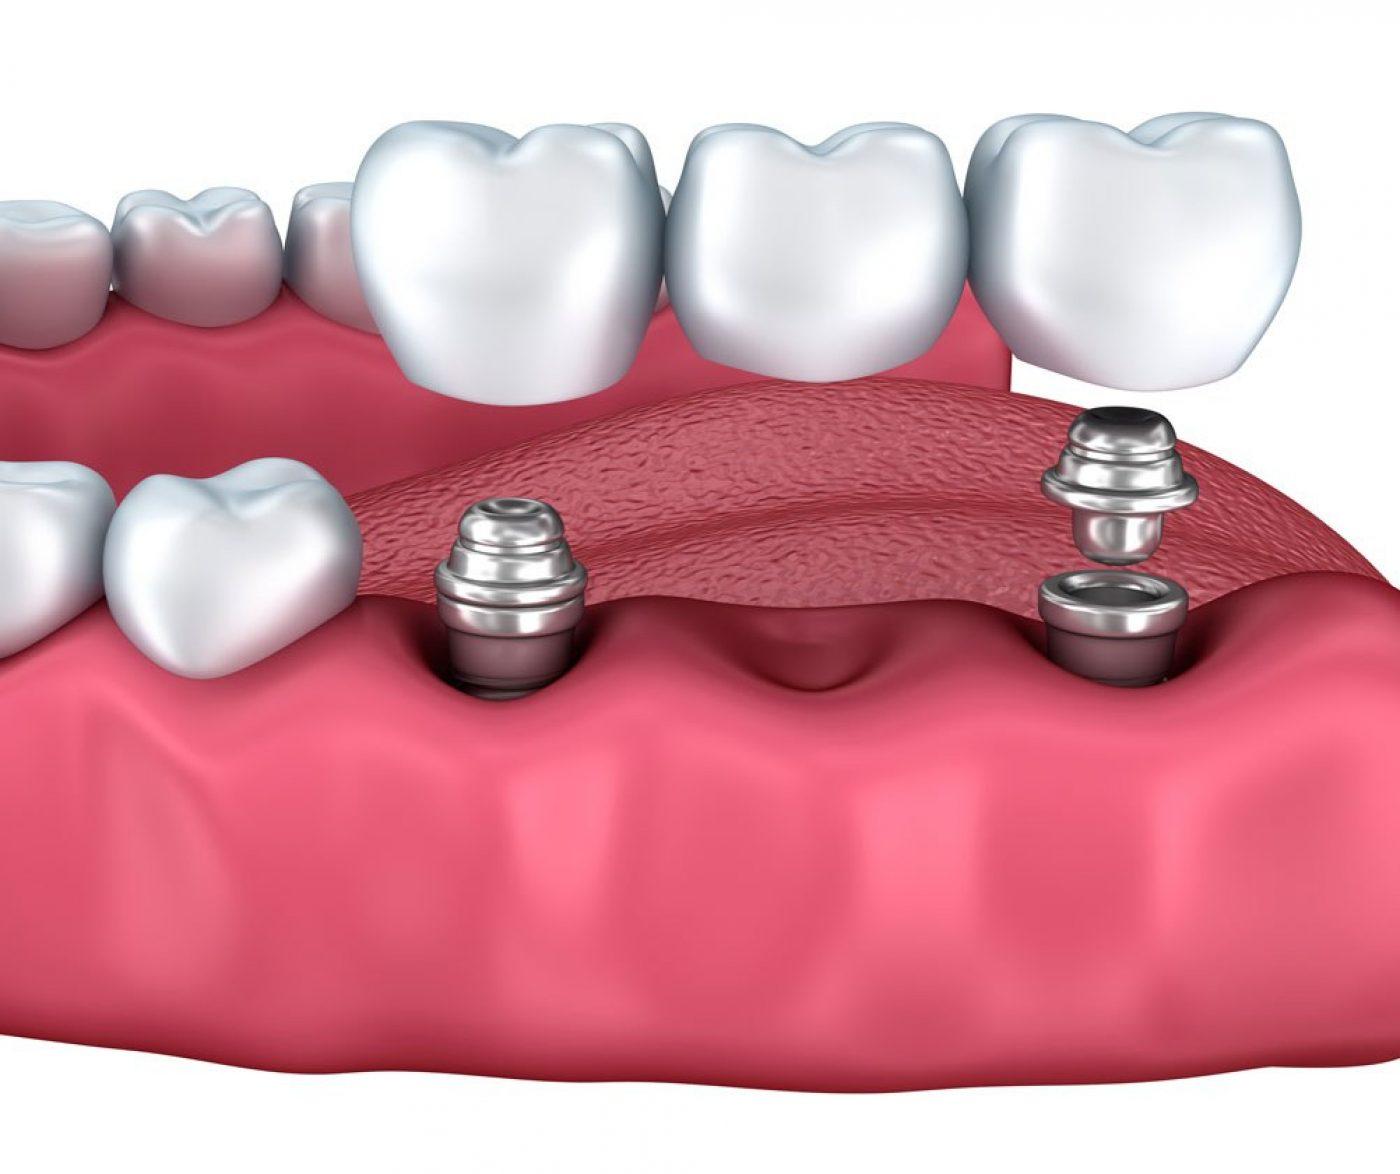 Dental Implants Multiple Jones Dental Implant Clinic Rugby